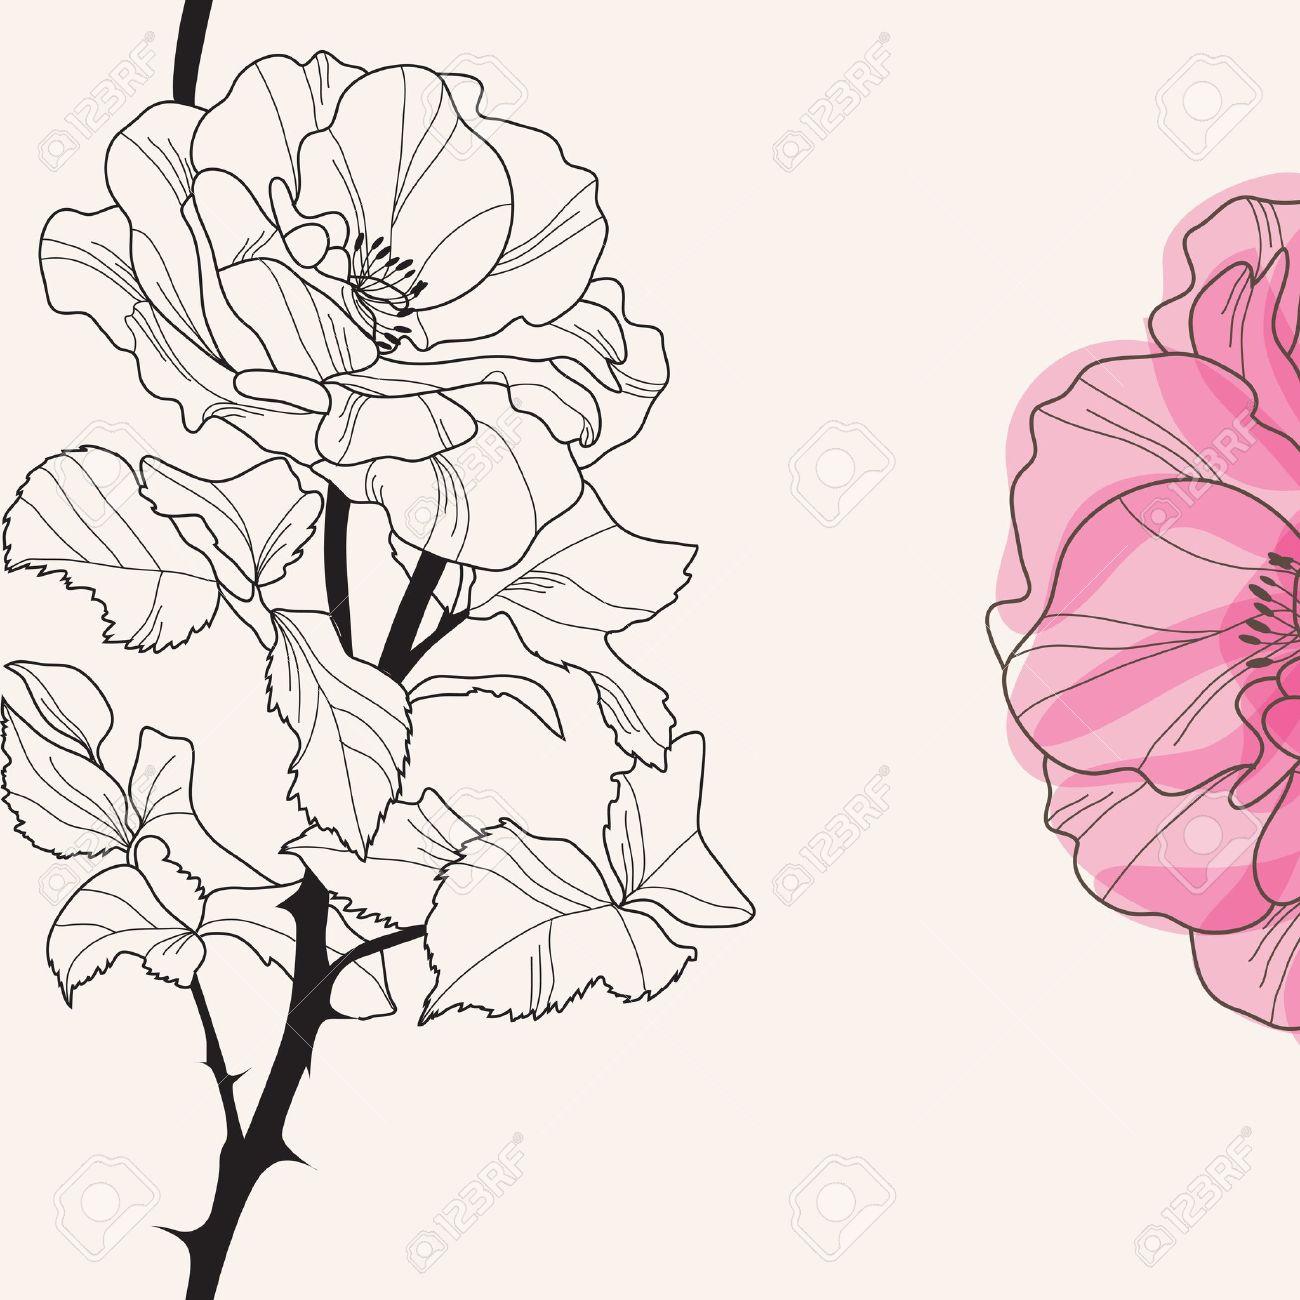 elegant floral invitation with hand drawn decorative rose Stock Vector - 20452057